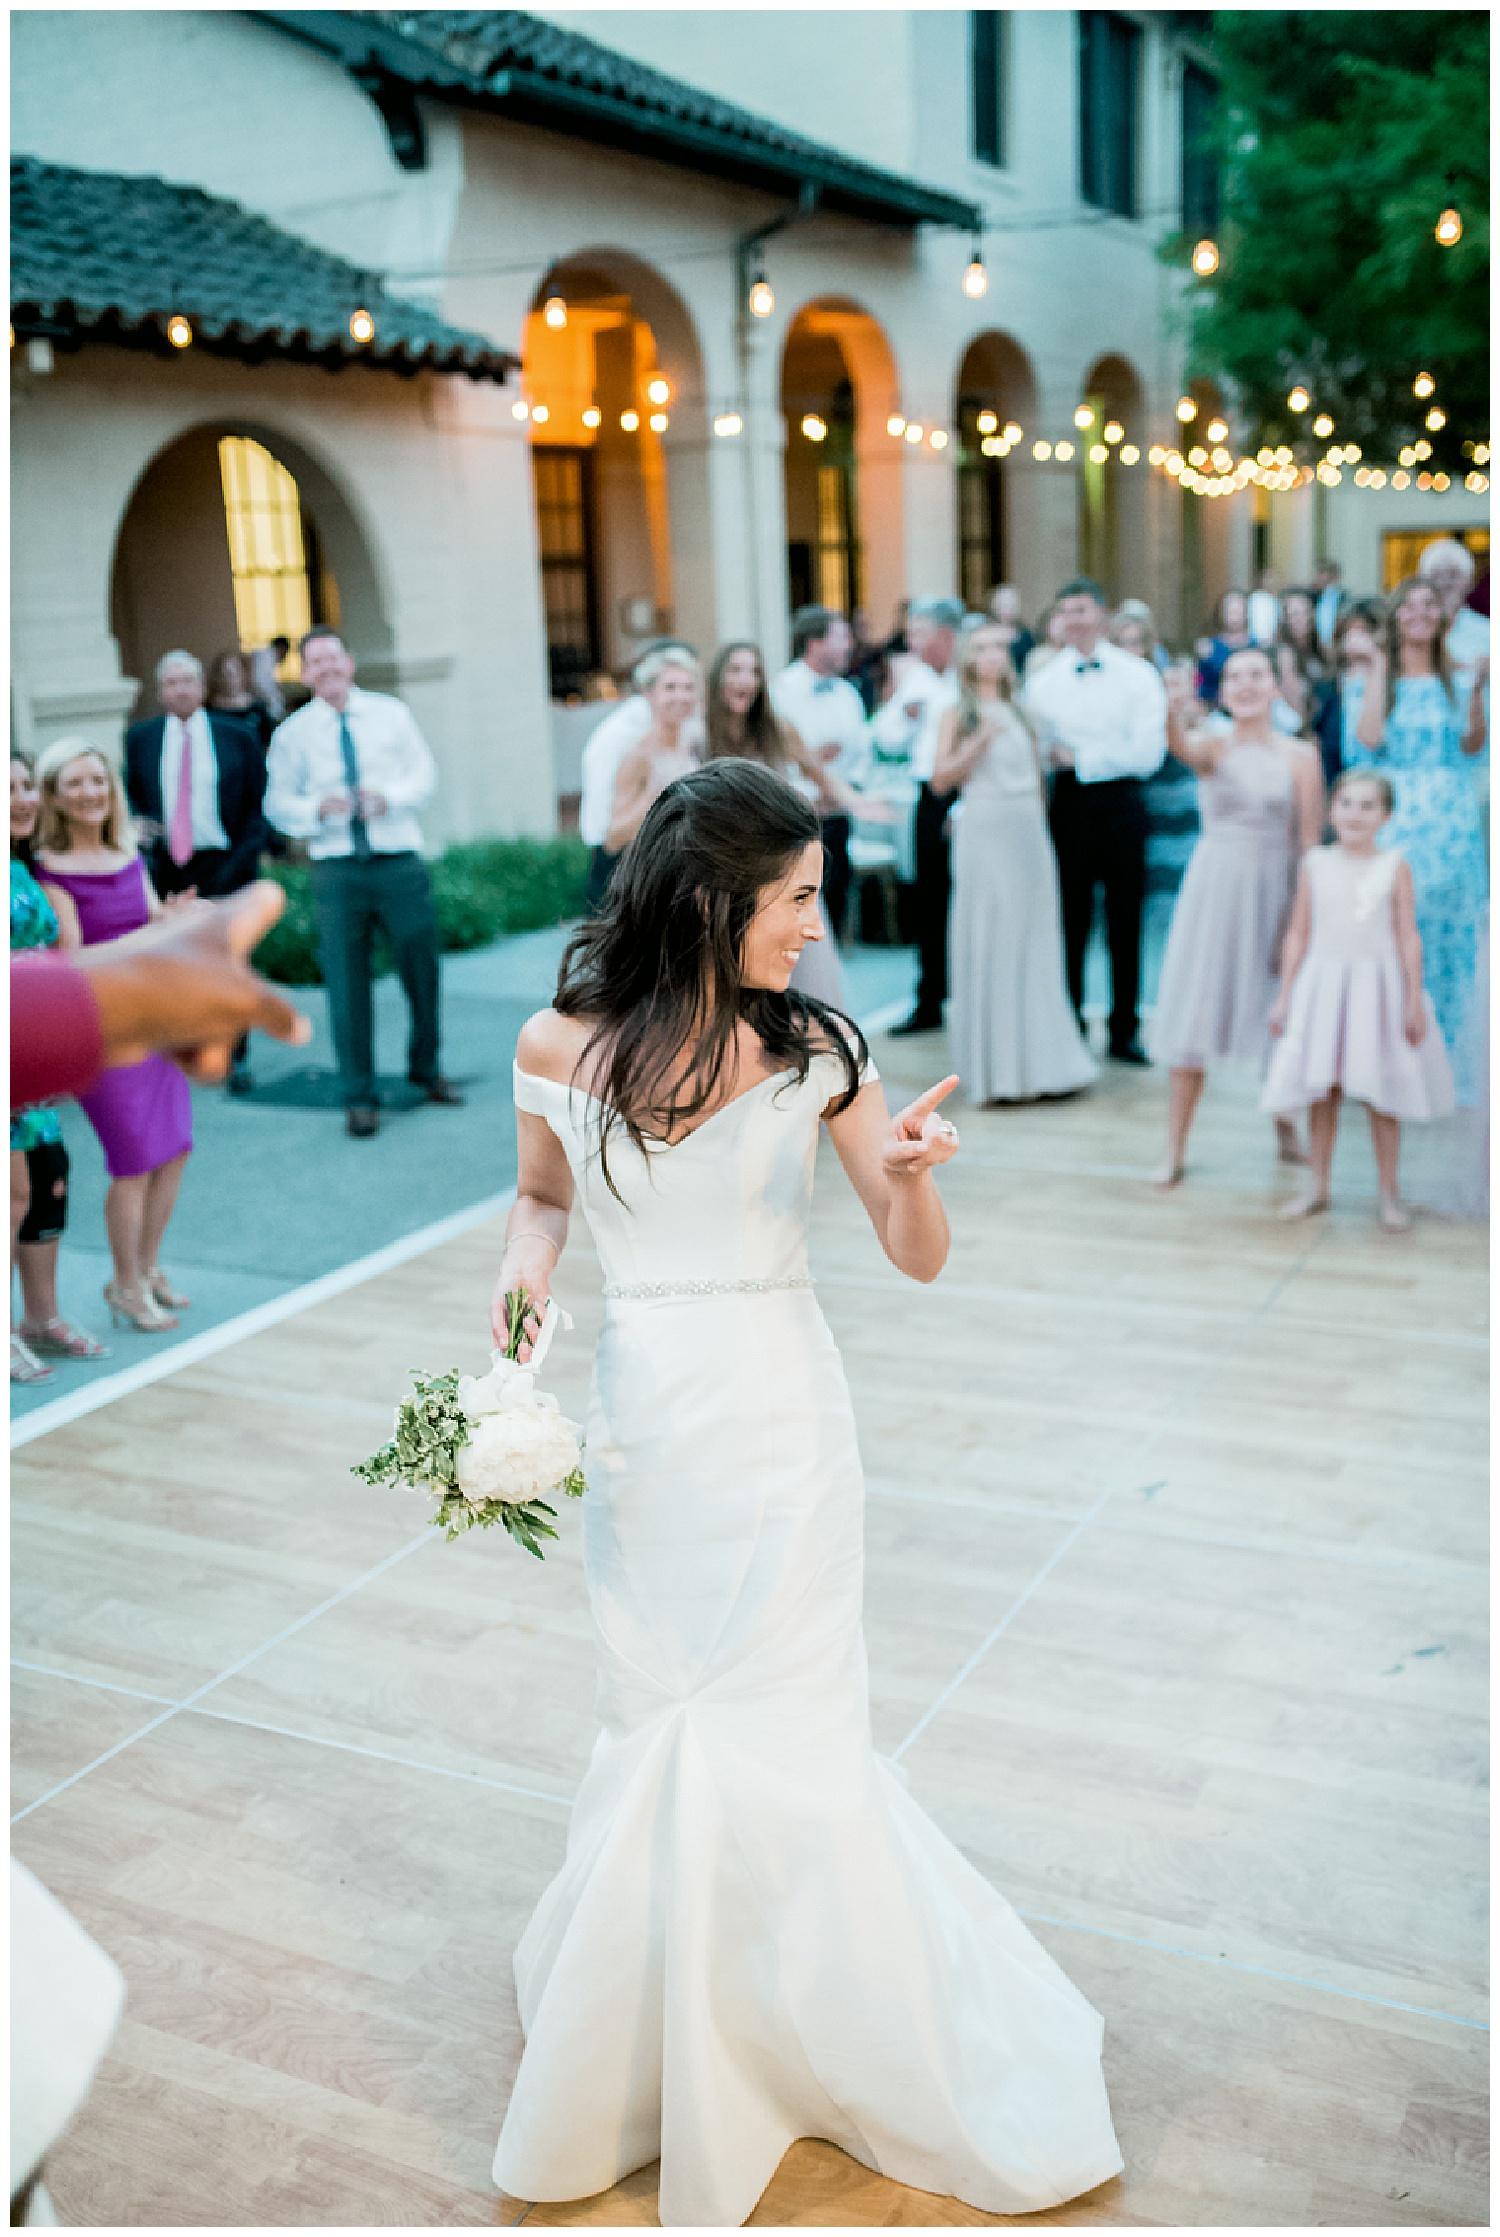 Janine_Licare_Photography_San_Francisco_Wedding_Photographer_0171.jpg